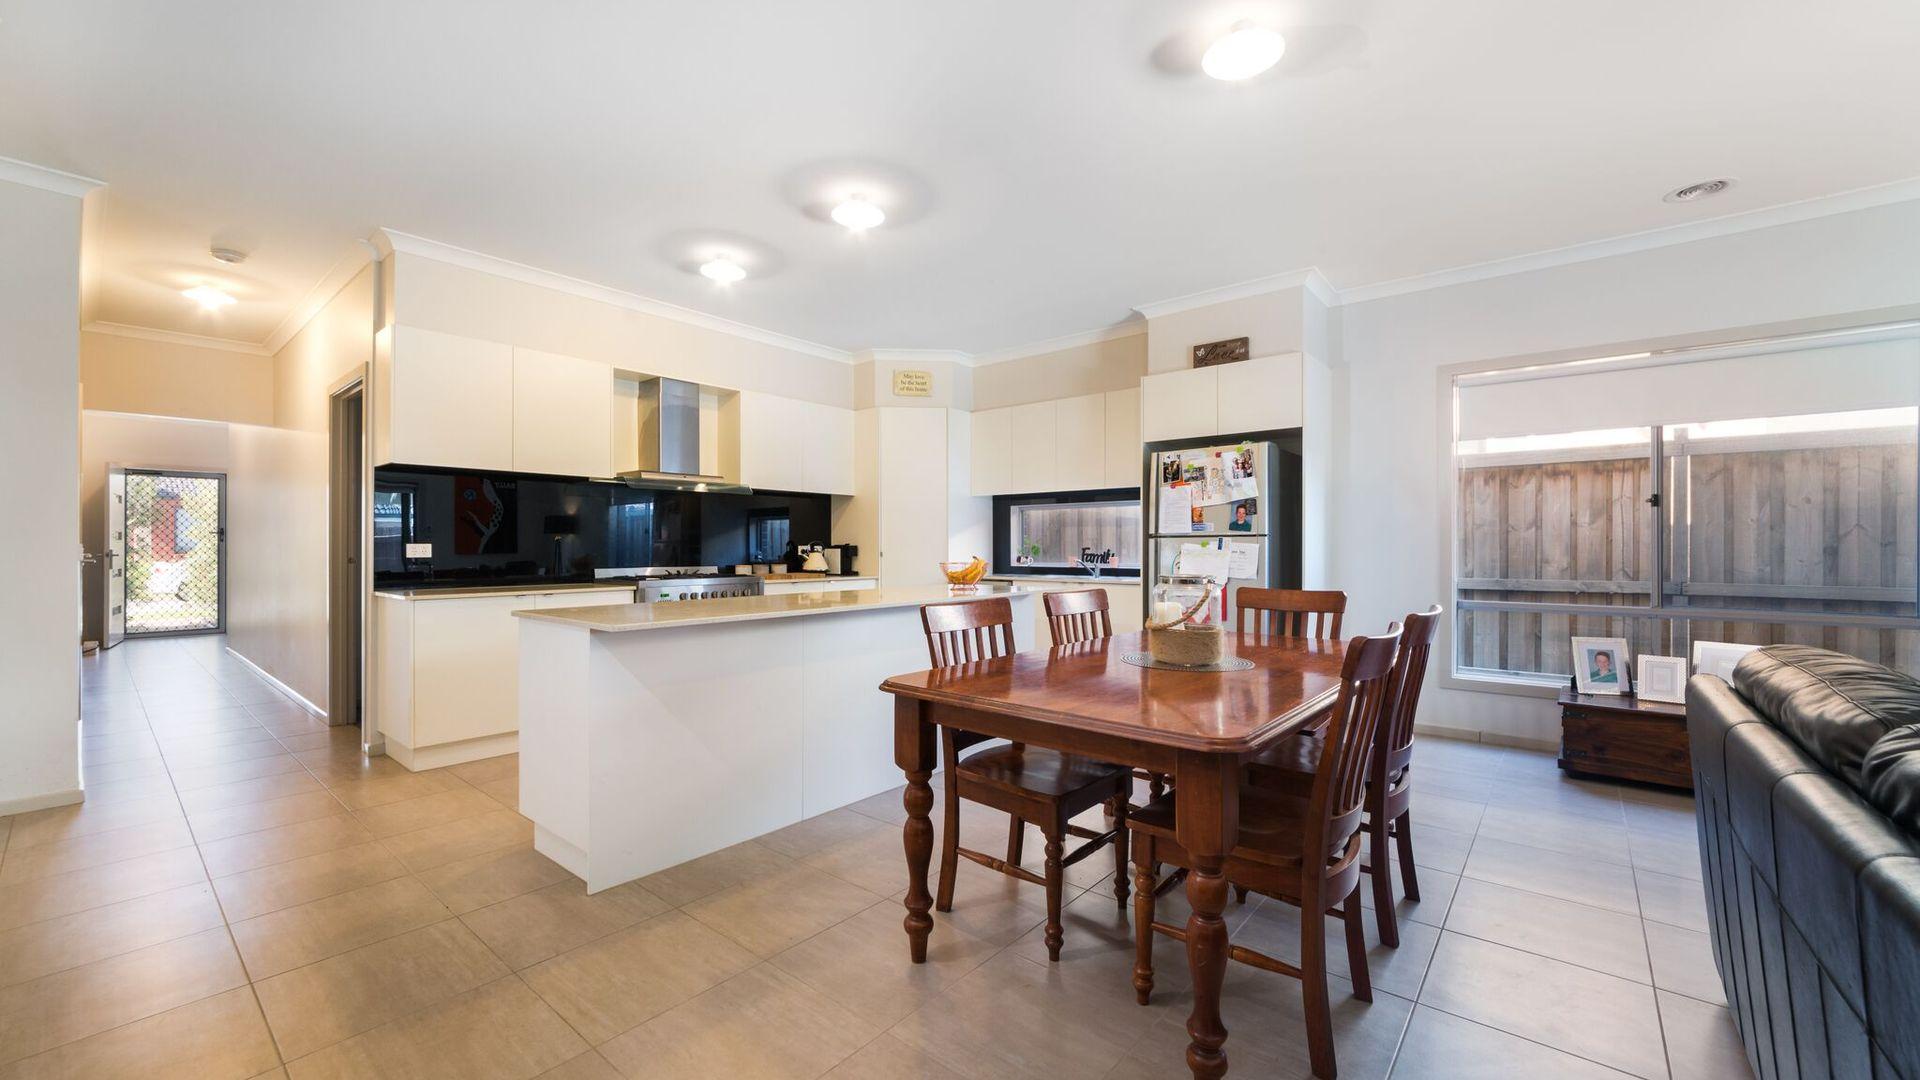 8 George Frederick  Road, Cranbourne West VIC 3977, Image 1